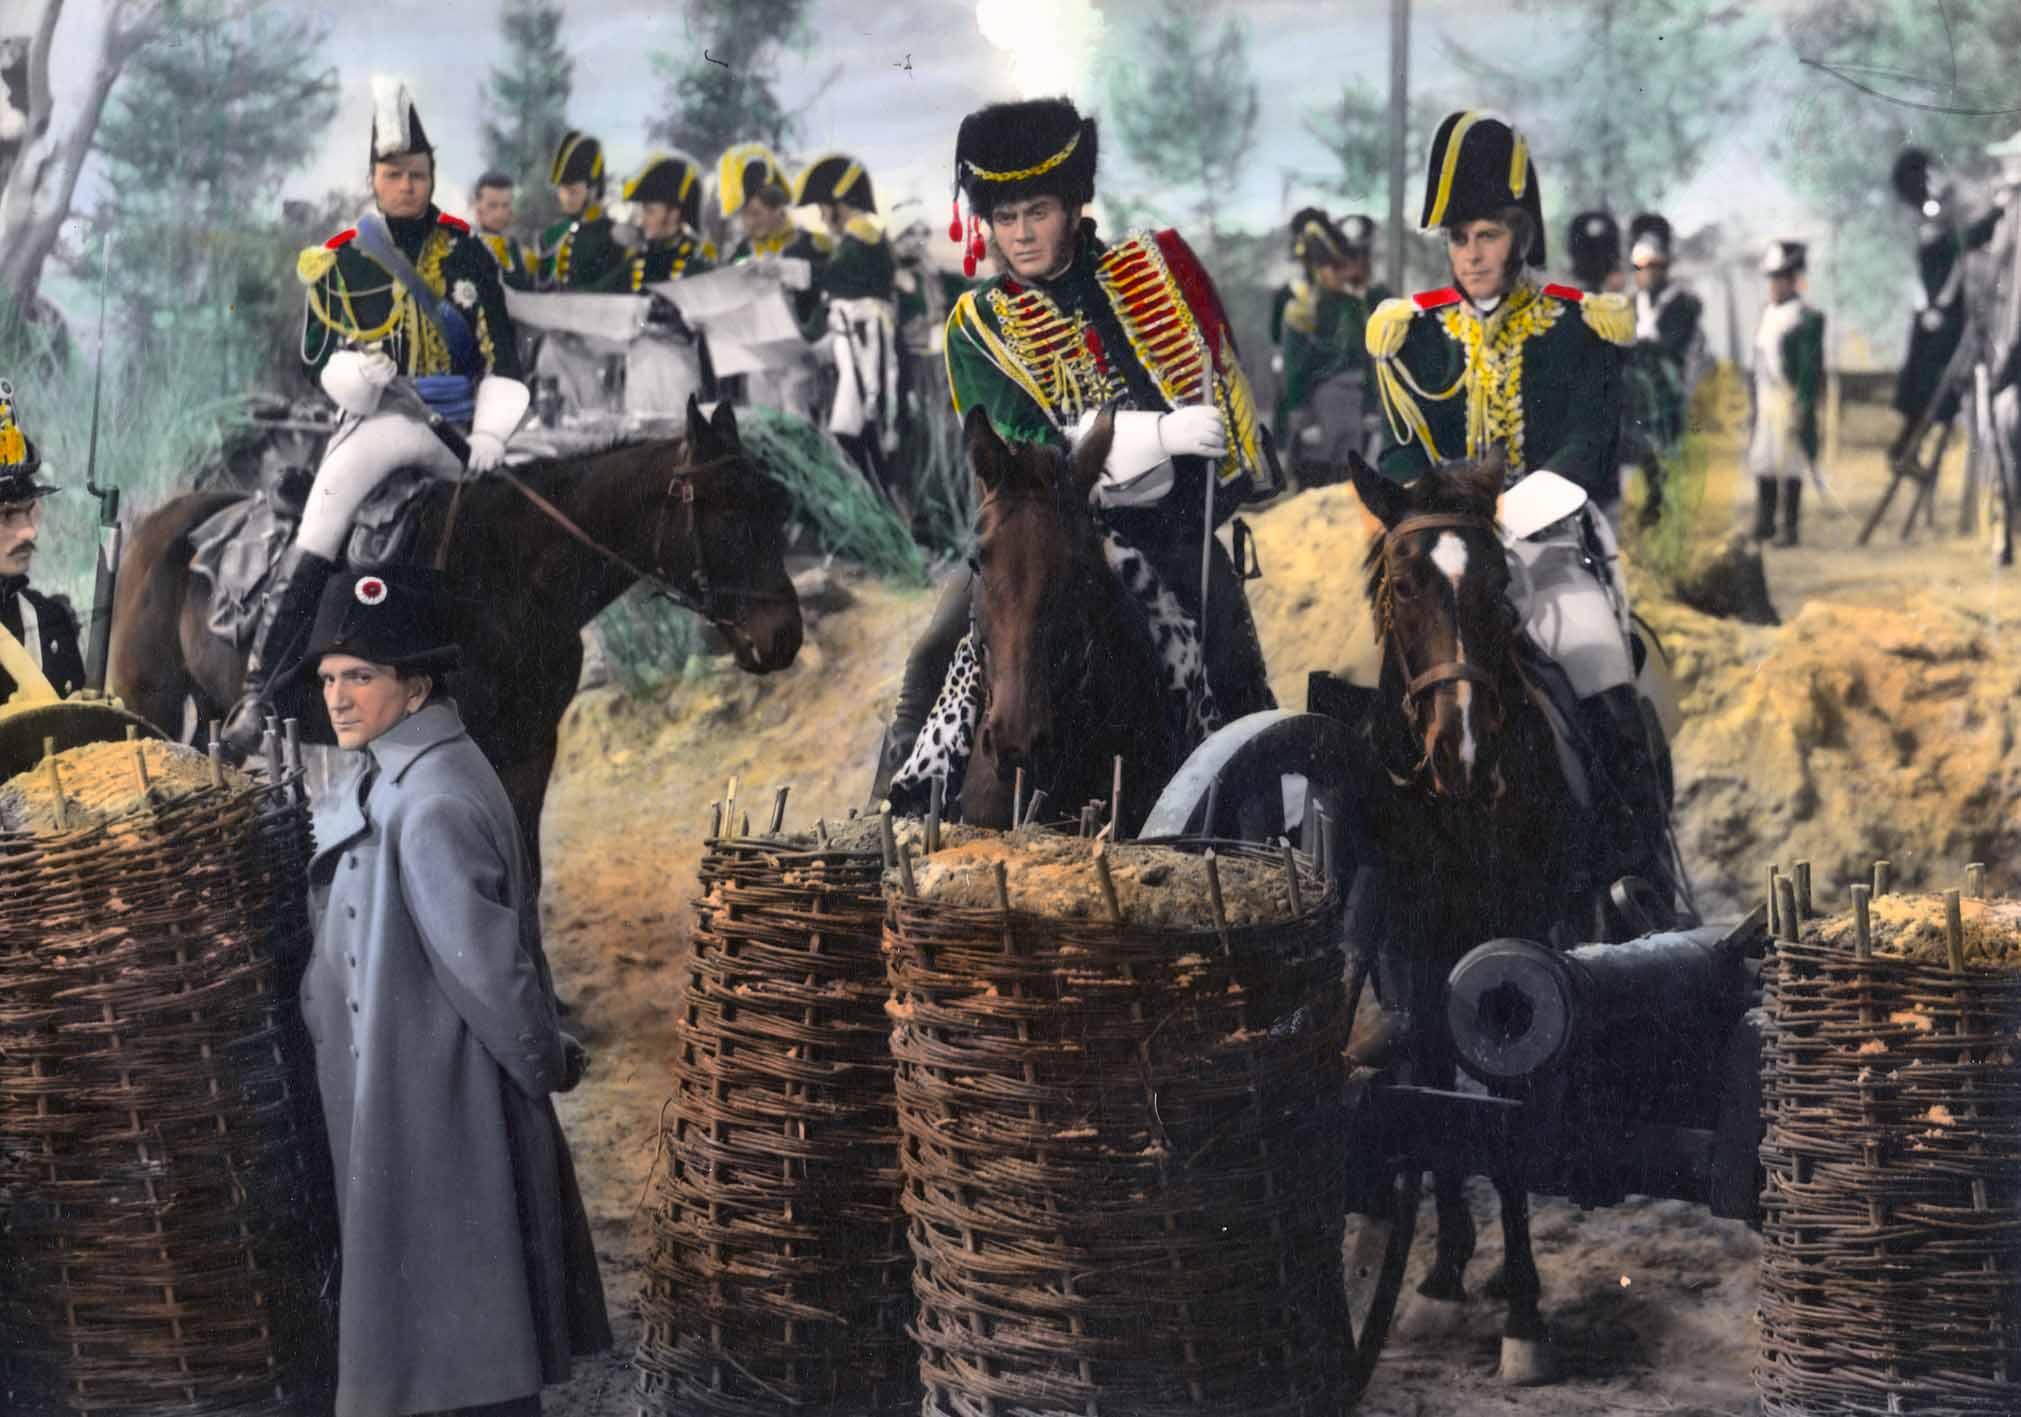 the battle of austerlitz2